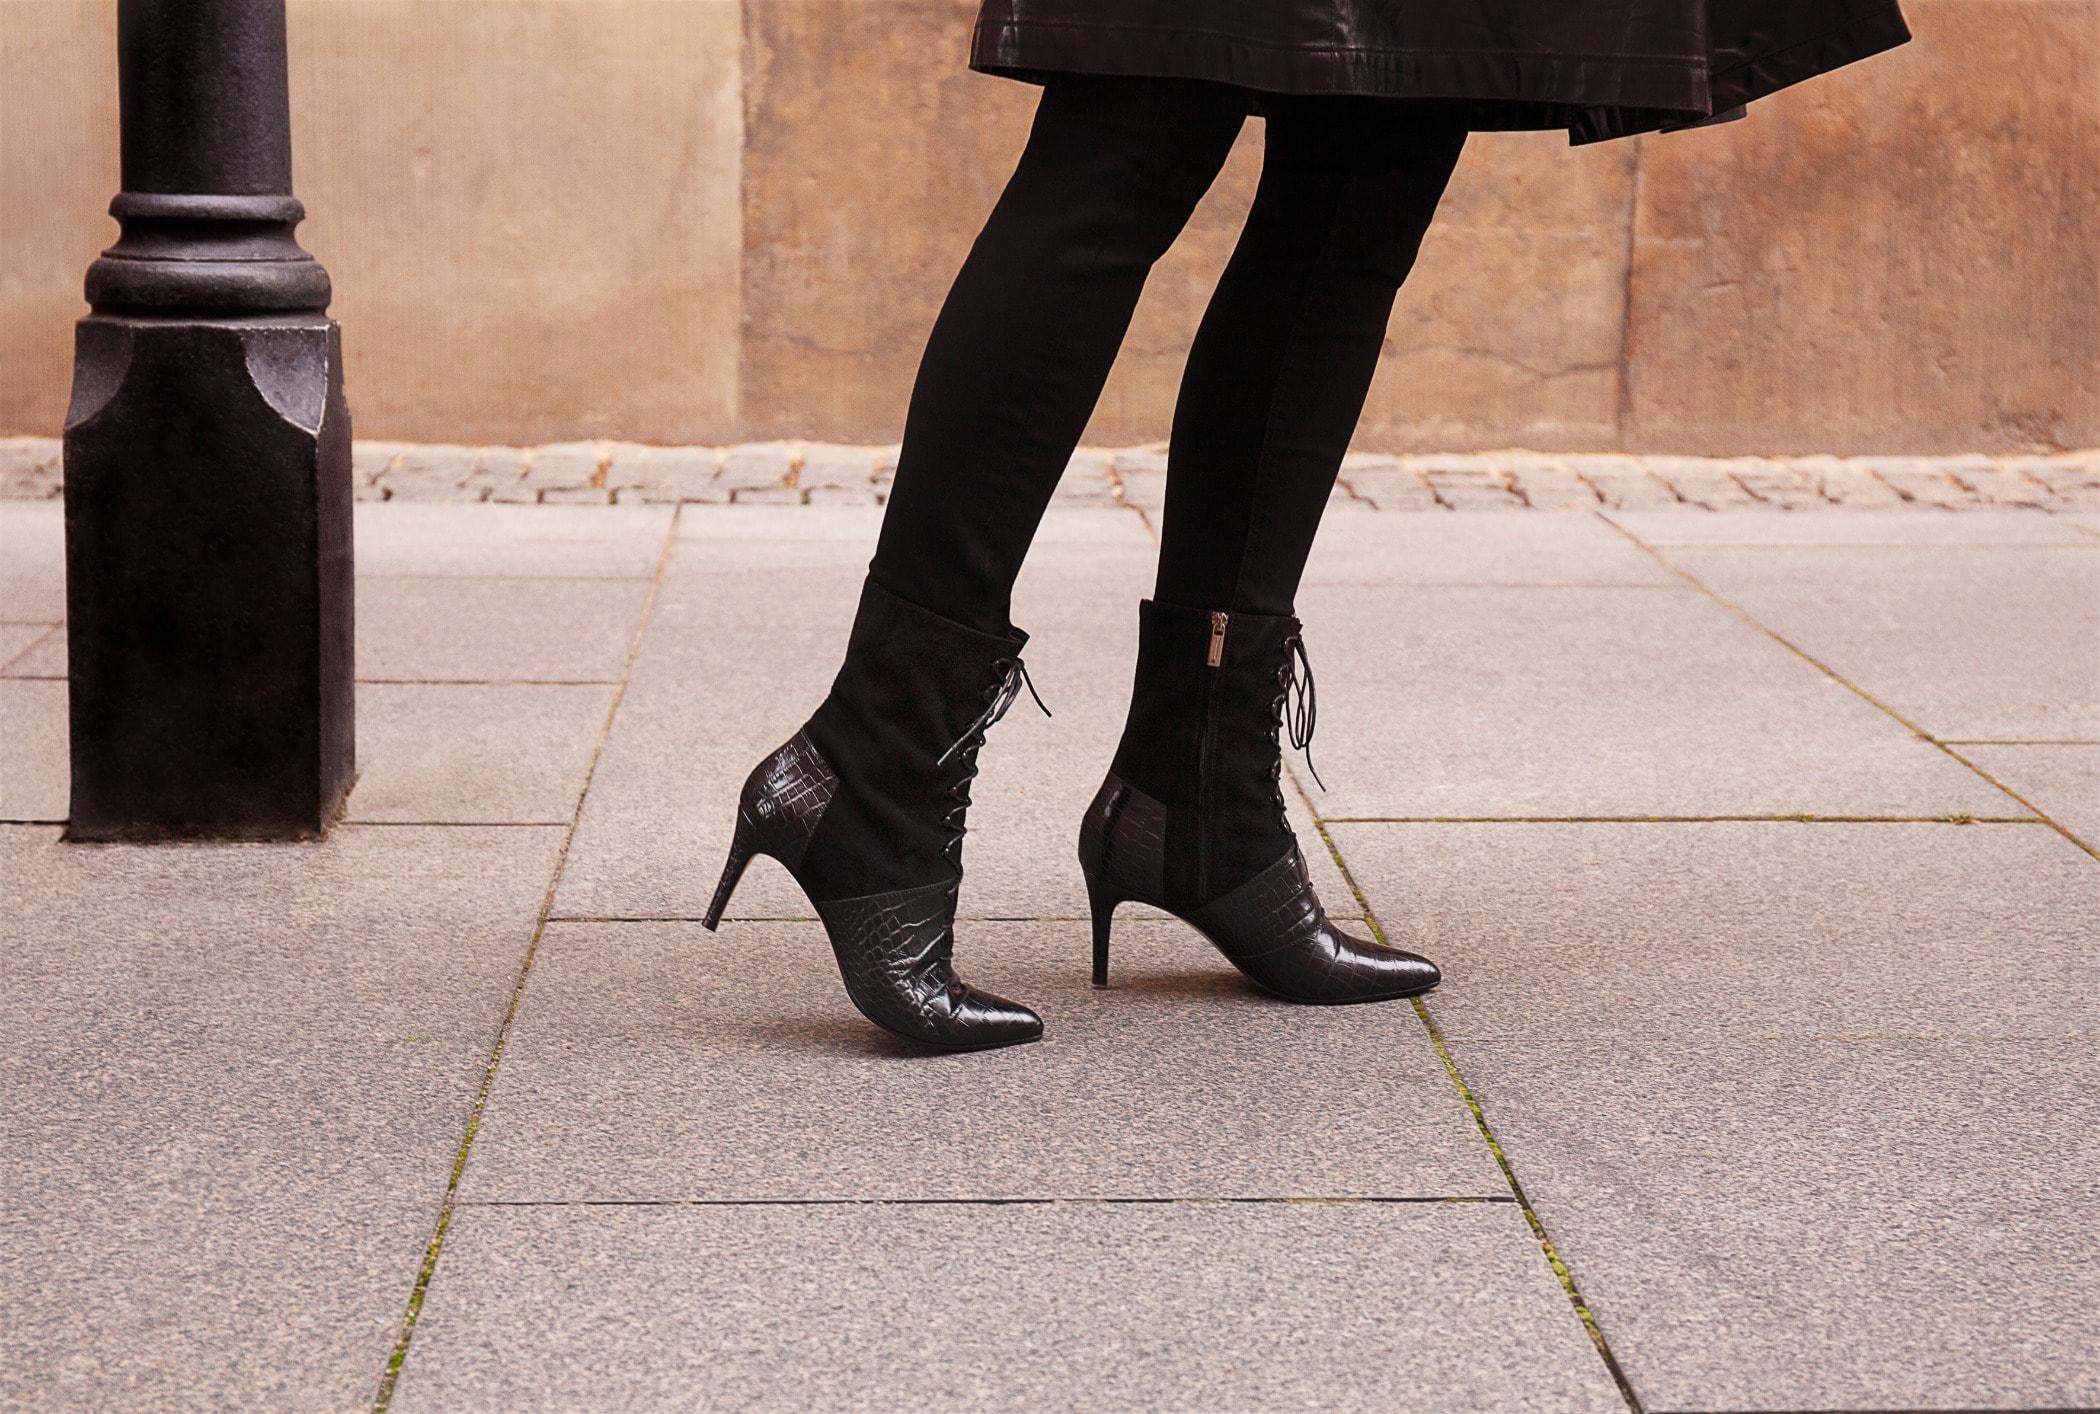 Human leg, High heels, Boot, Standing, Joint, Shoe, Ankle, Black, Footwear